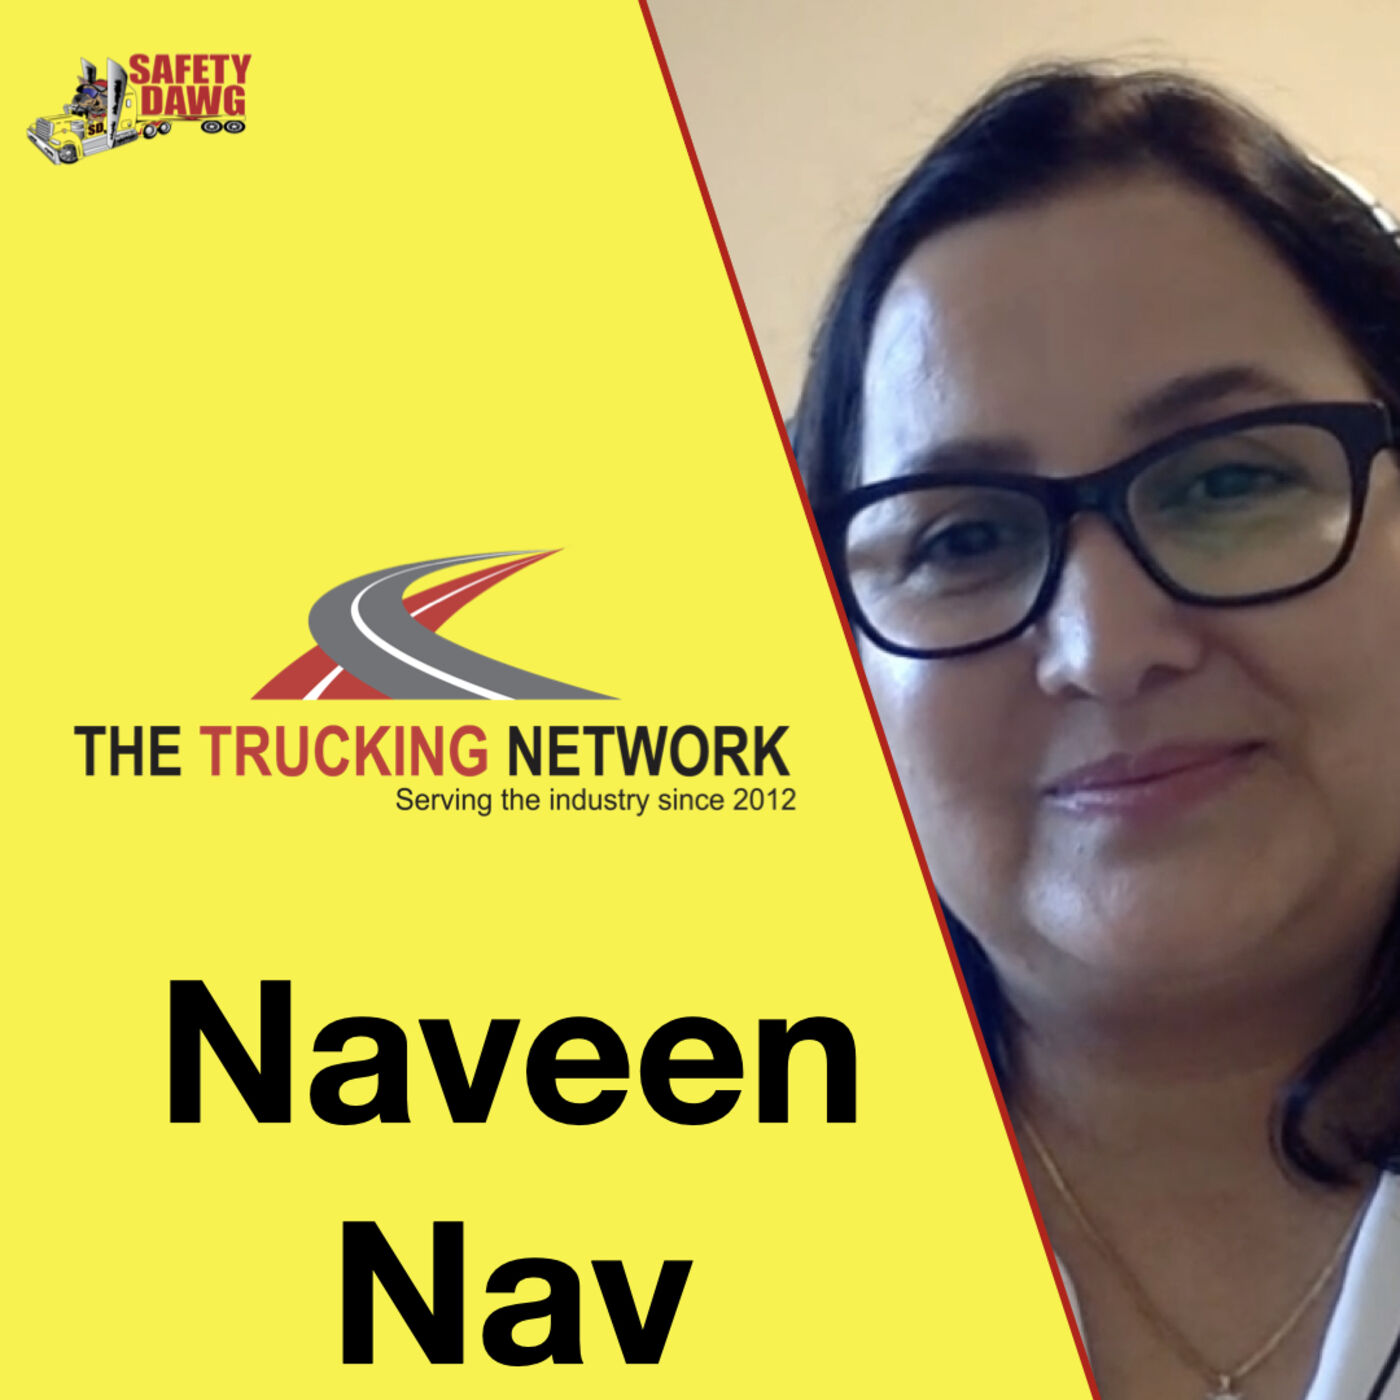 30. The Trucking Network, Naveen Nav